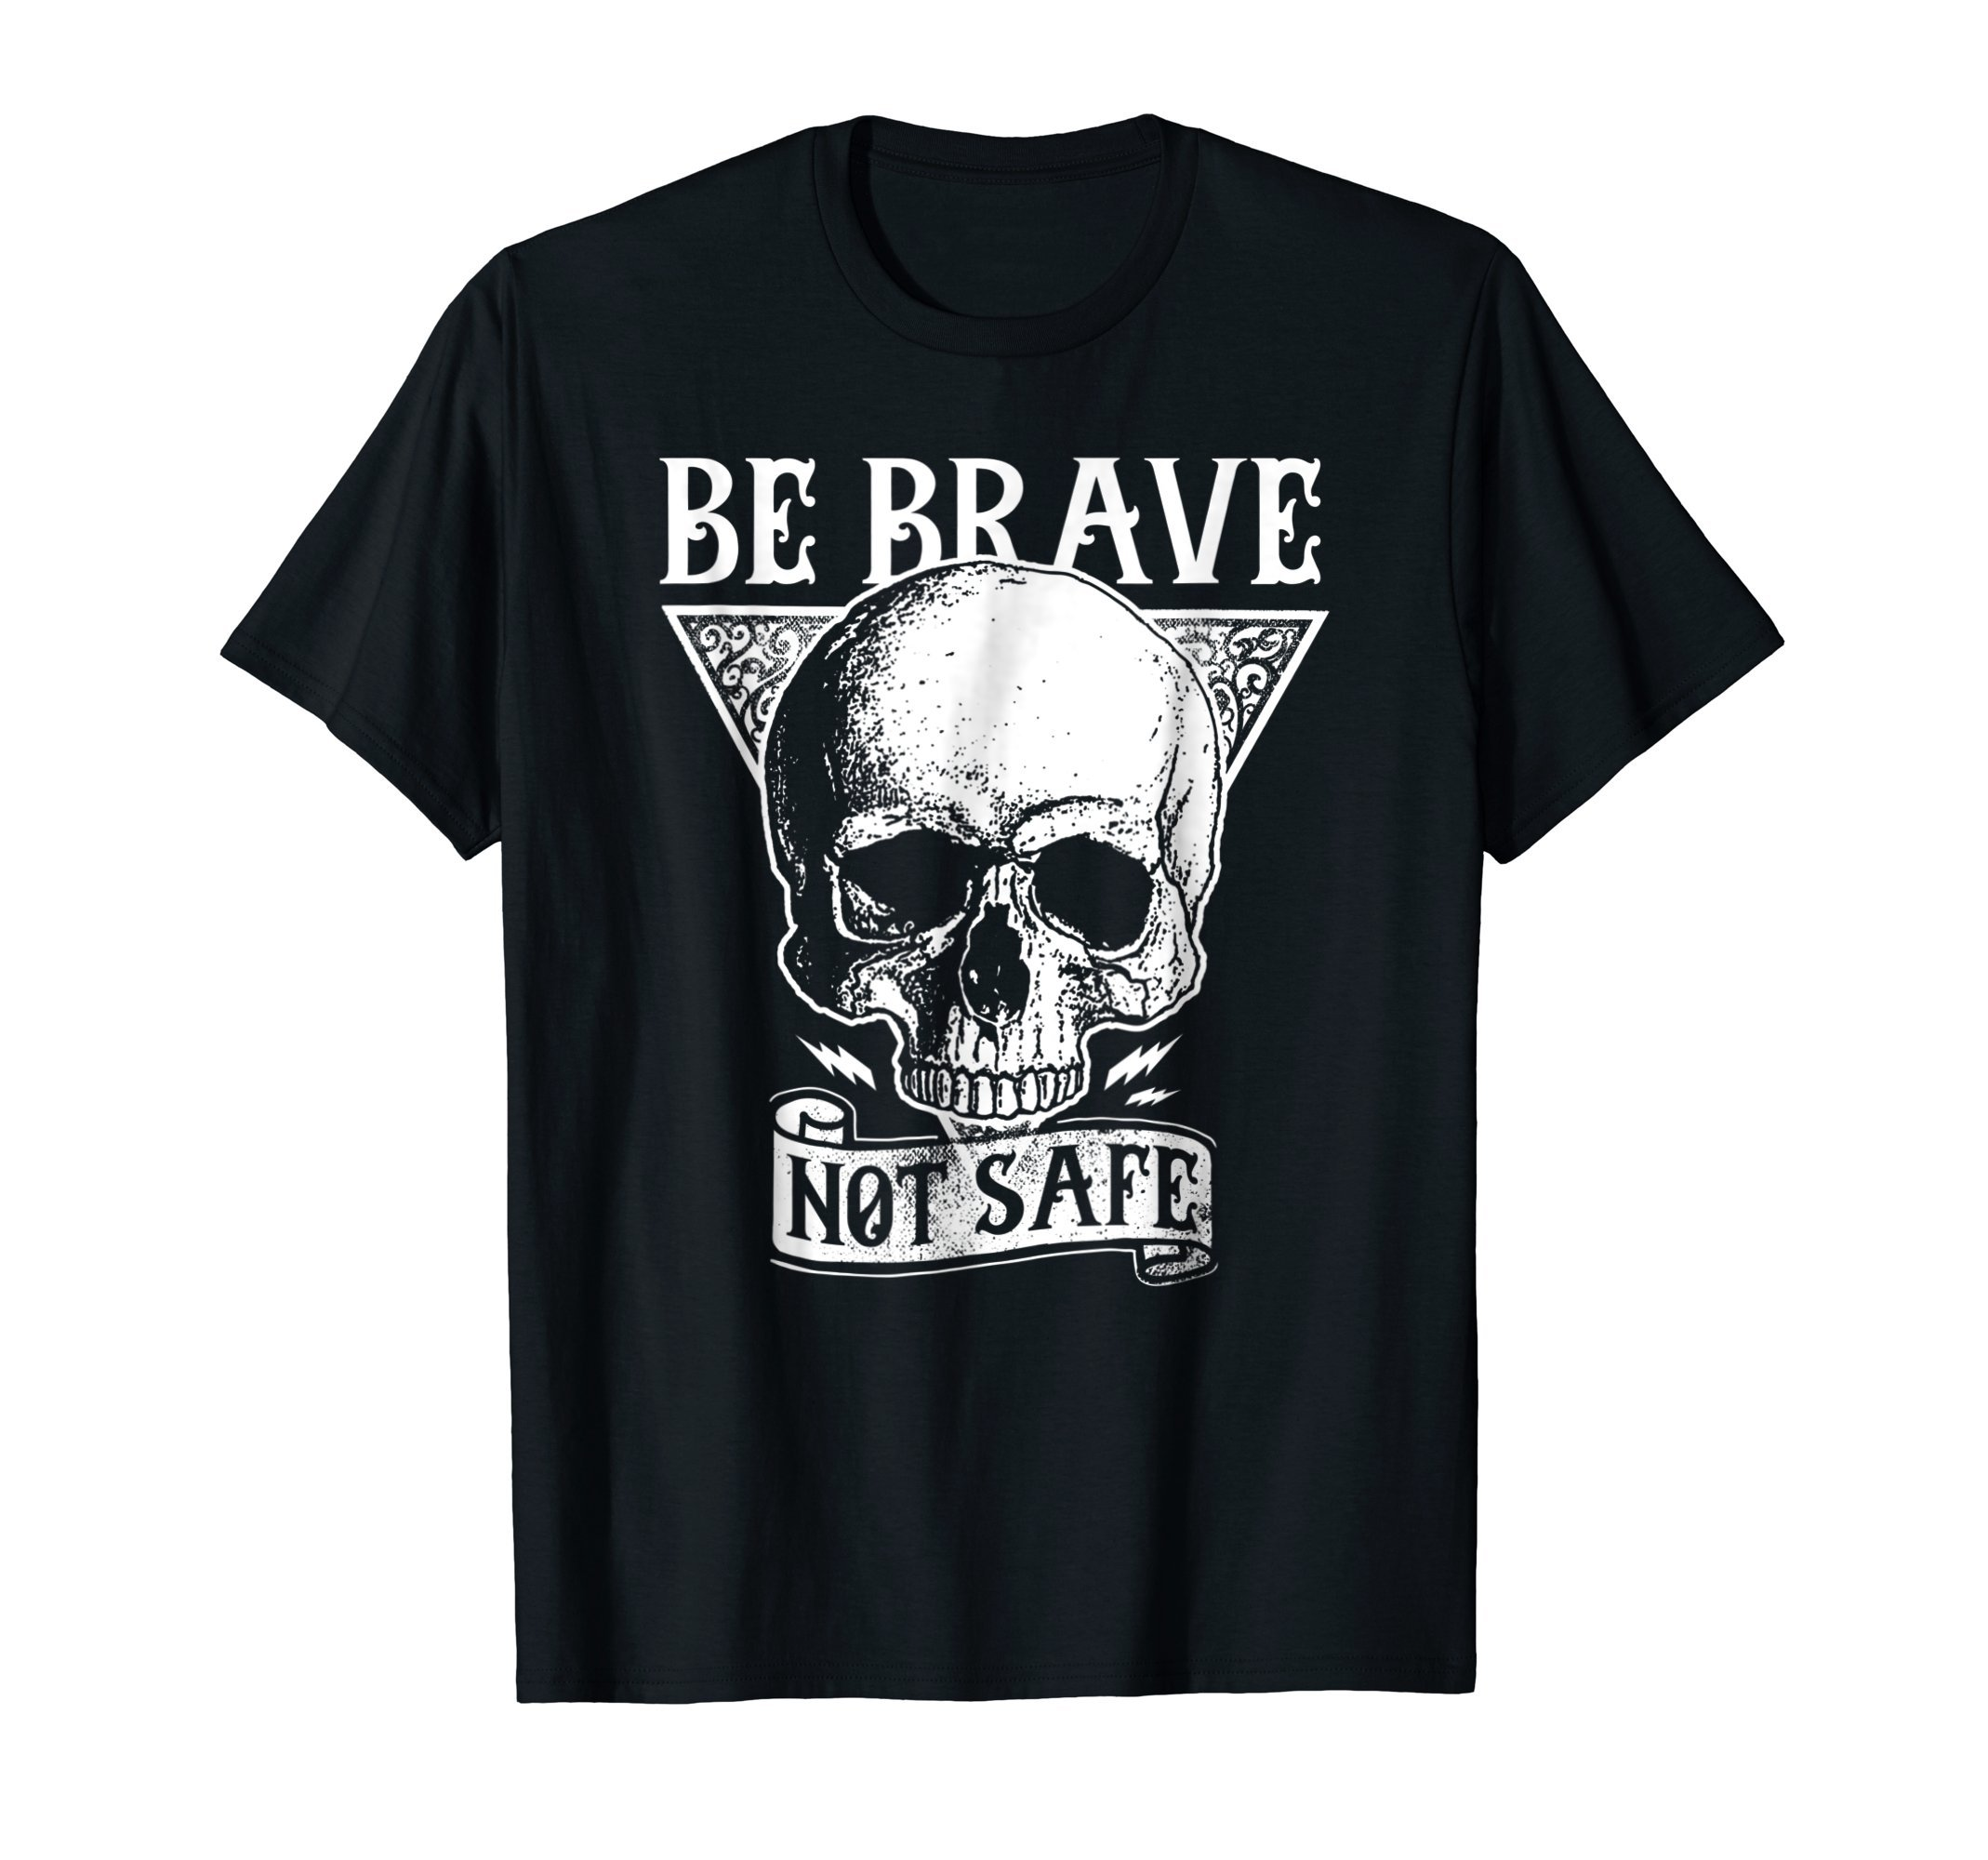 Be-Brave-Not-Safe-Motorcycle-Biker-Gift-T-Shirt-Shirt-Tee